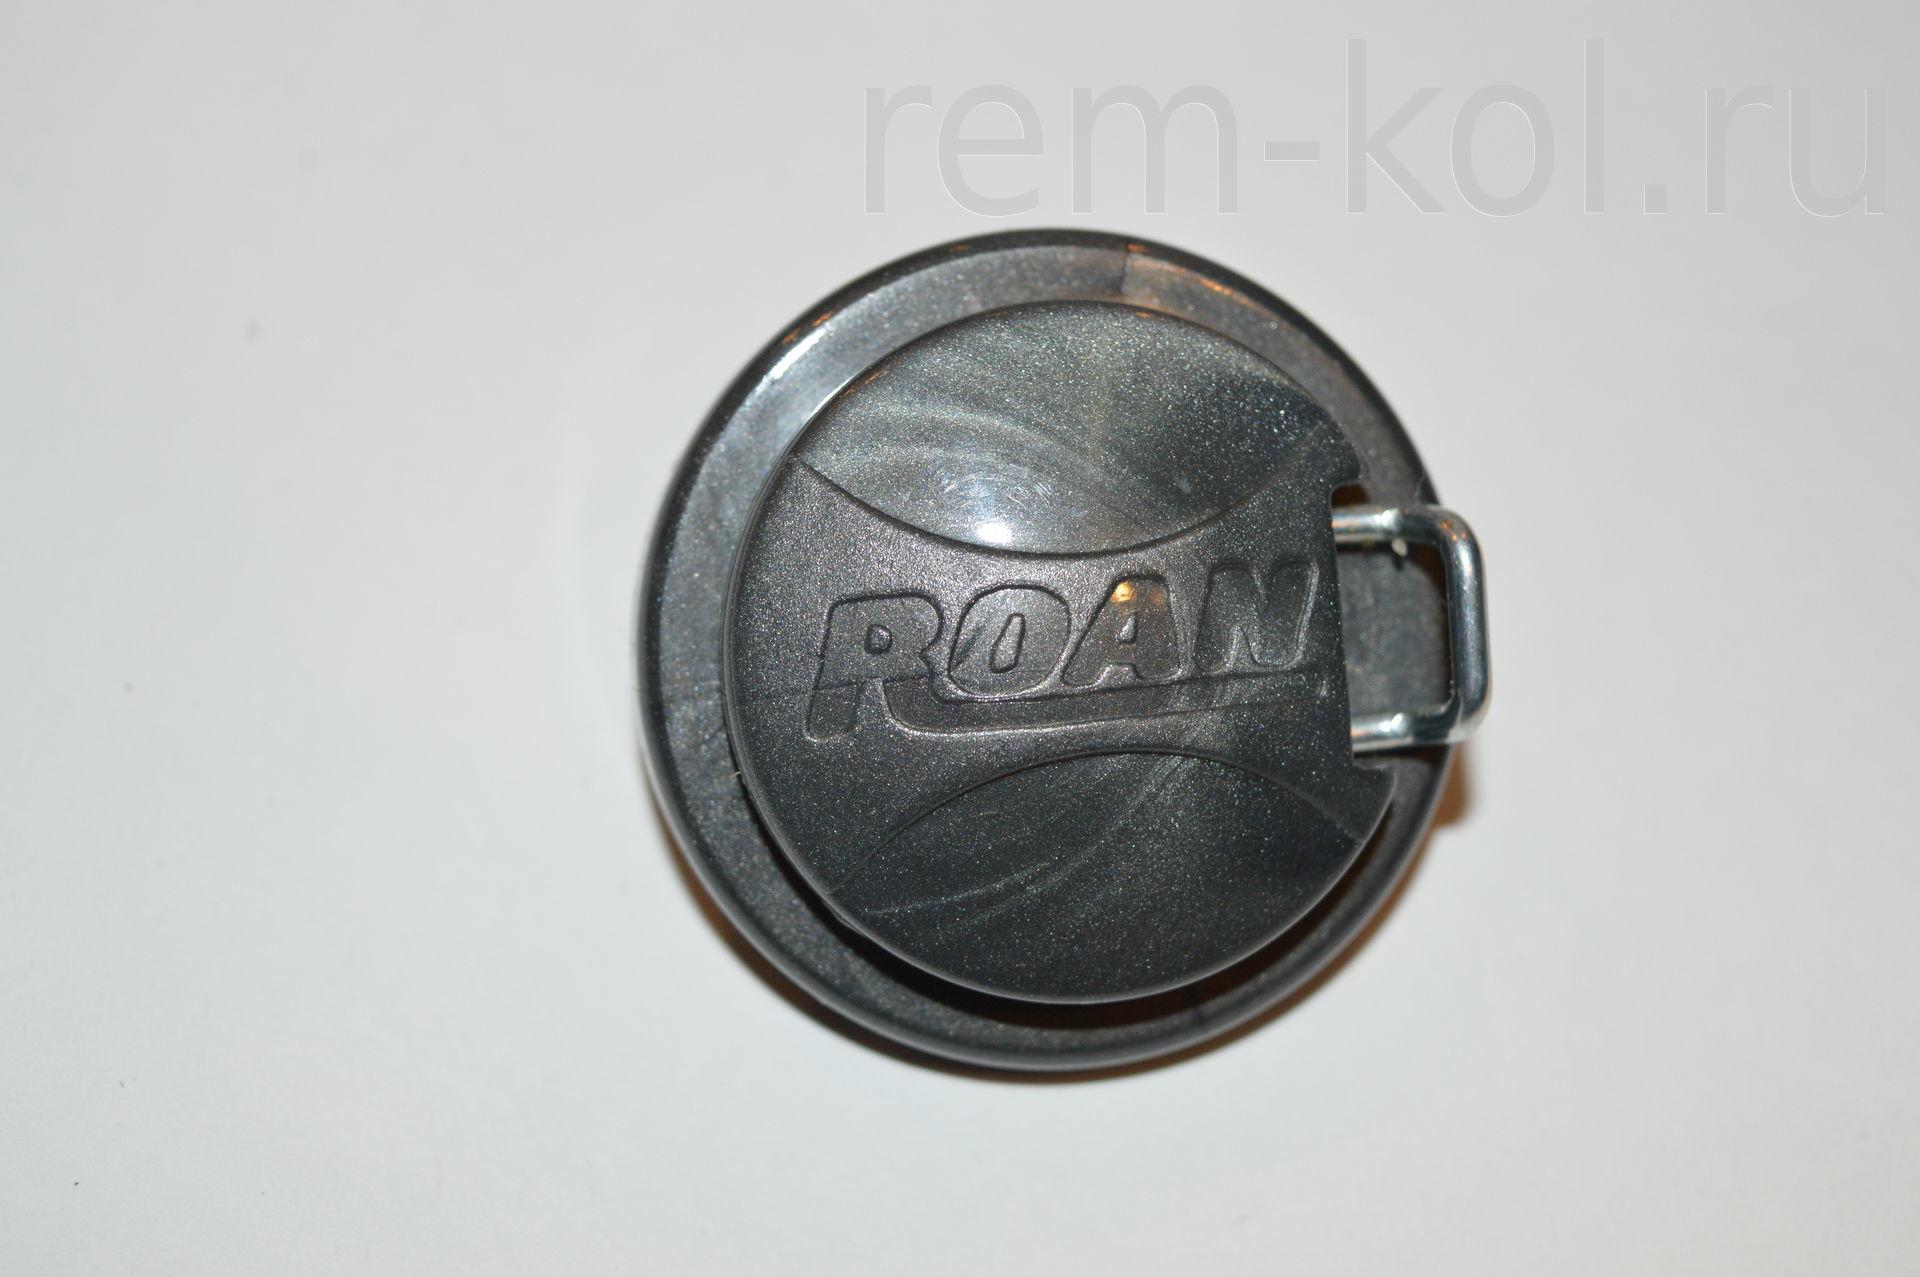 Втулка для колеса Roan